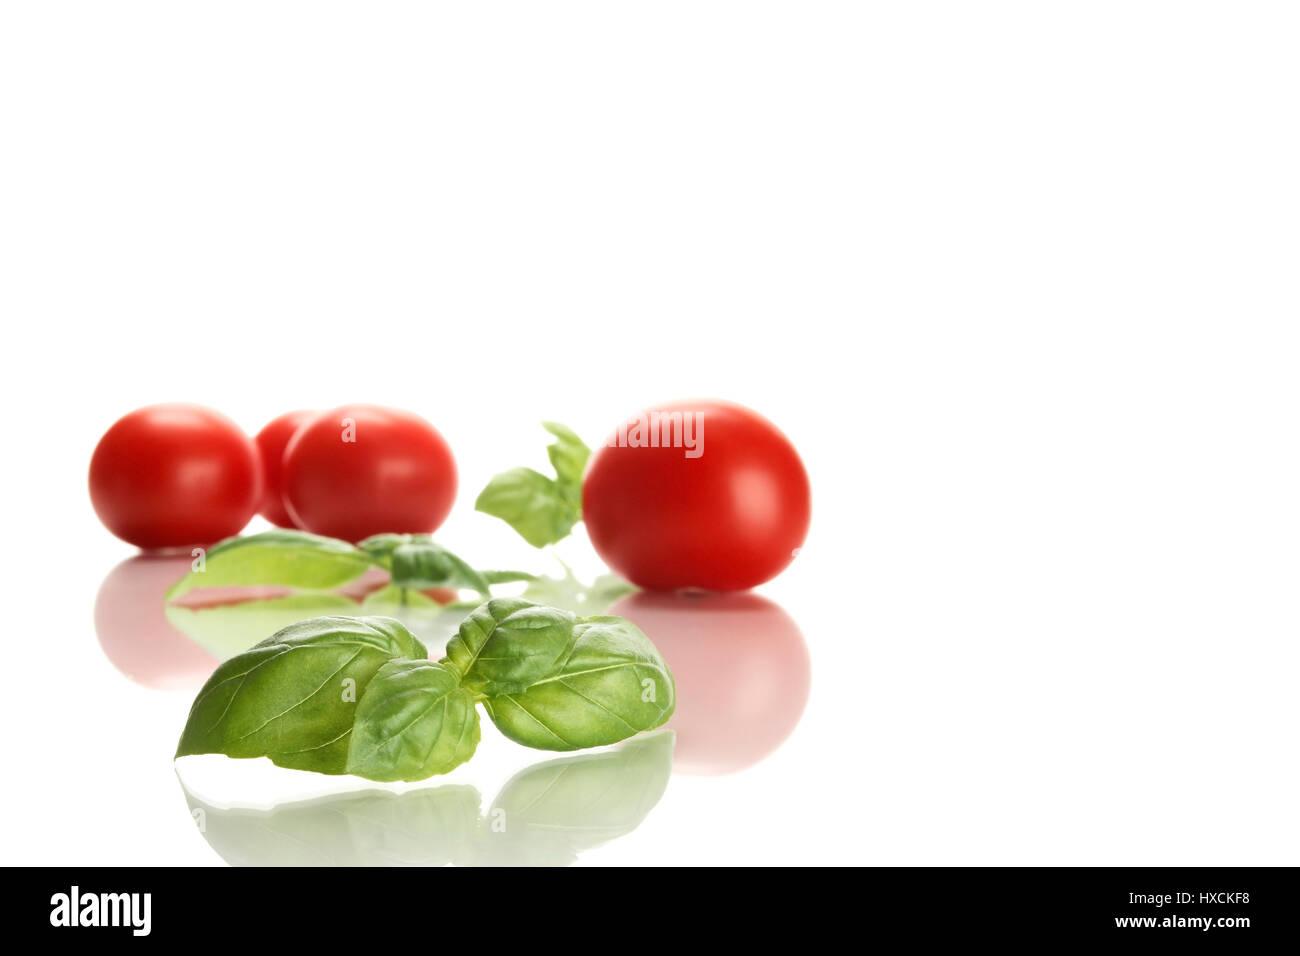 Tomatoes and basil, Tomaten und Basilikum Stock Photo